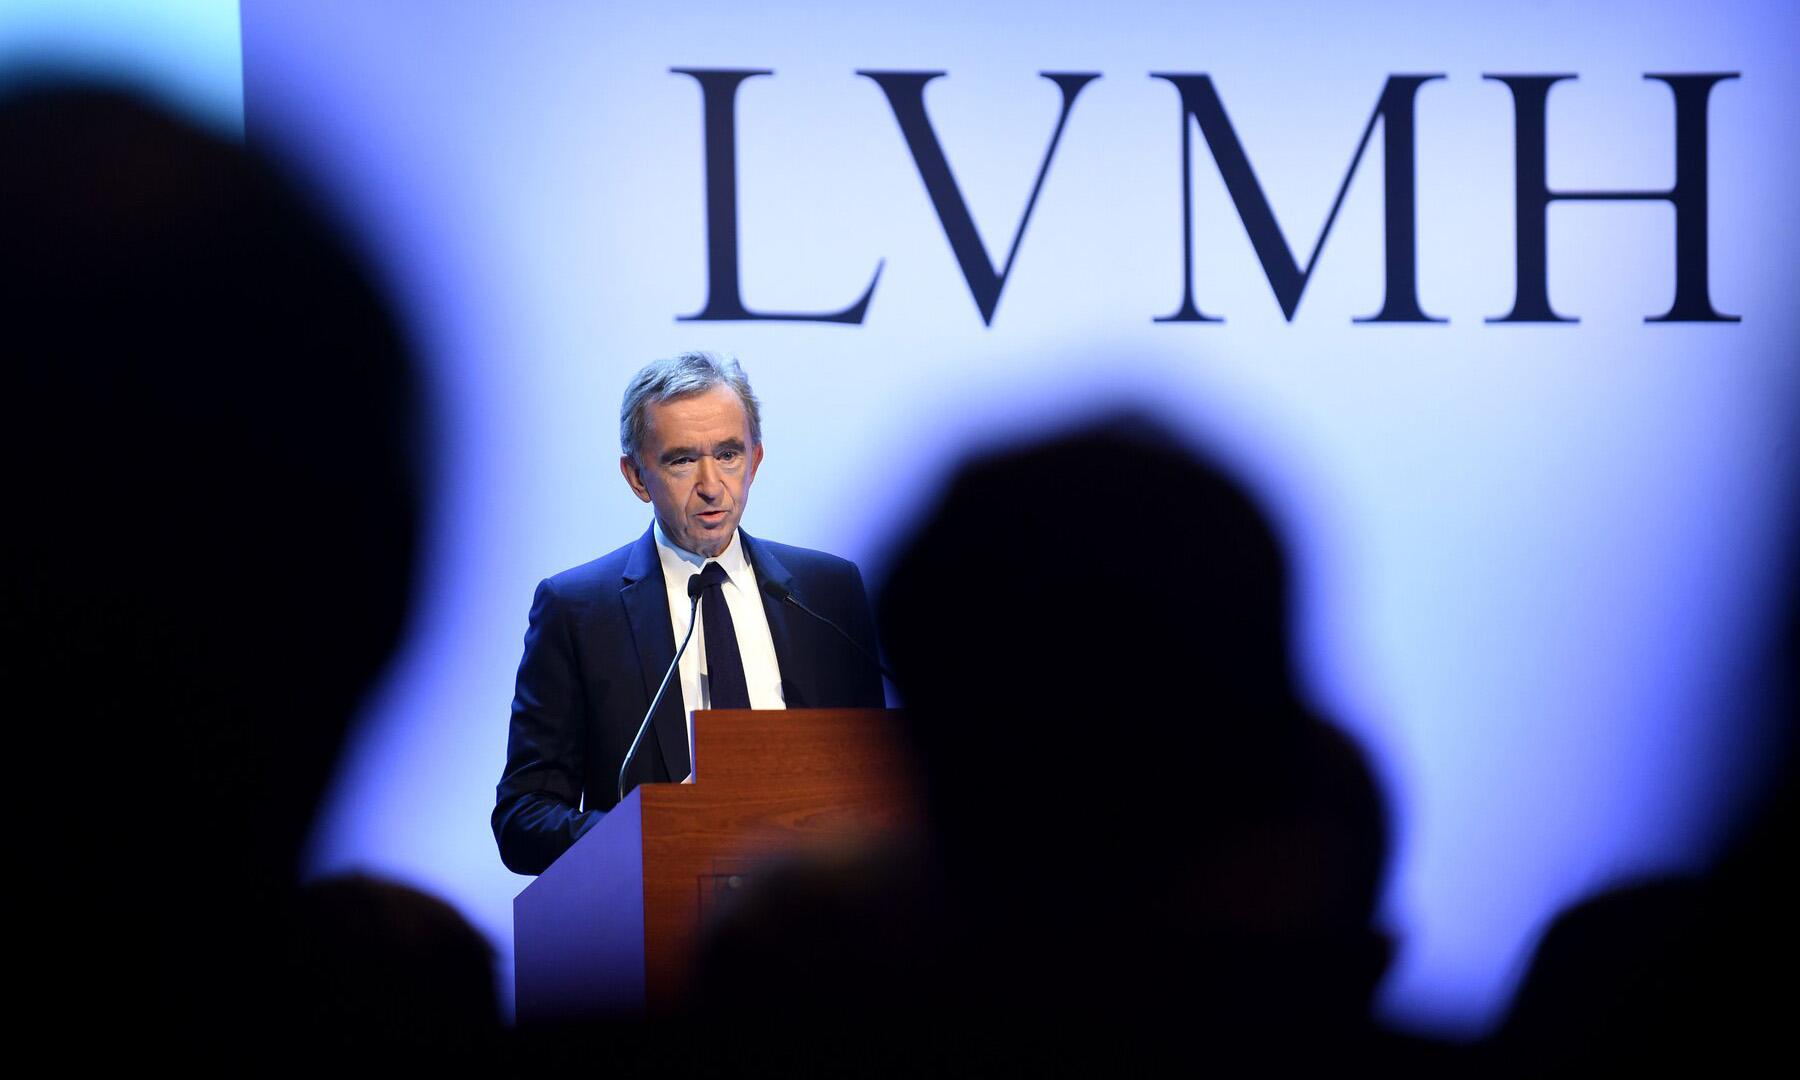 LVMH 成过去 20 年收购最多品牌的奢侈品集团